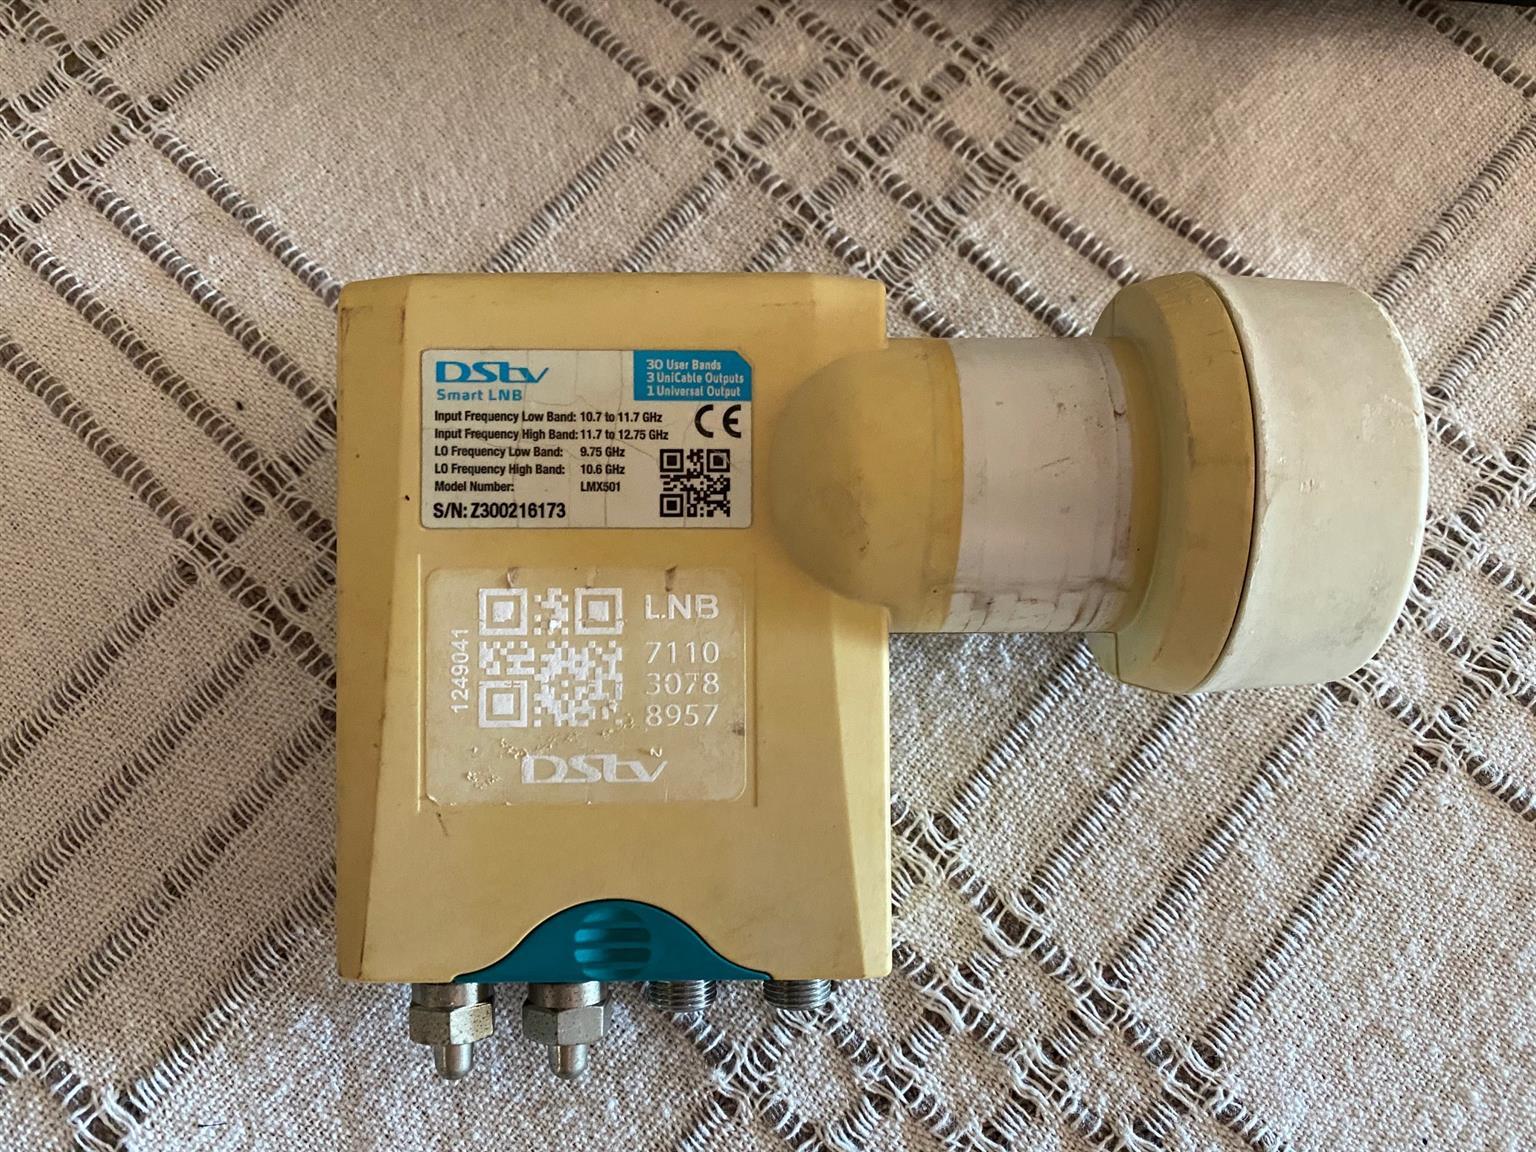 DSTV Explora 2A decoder